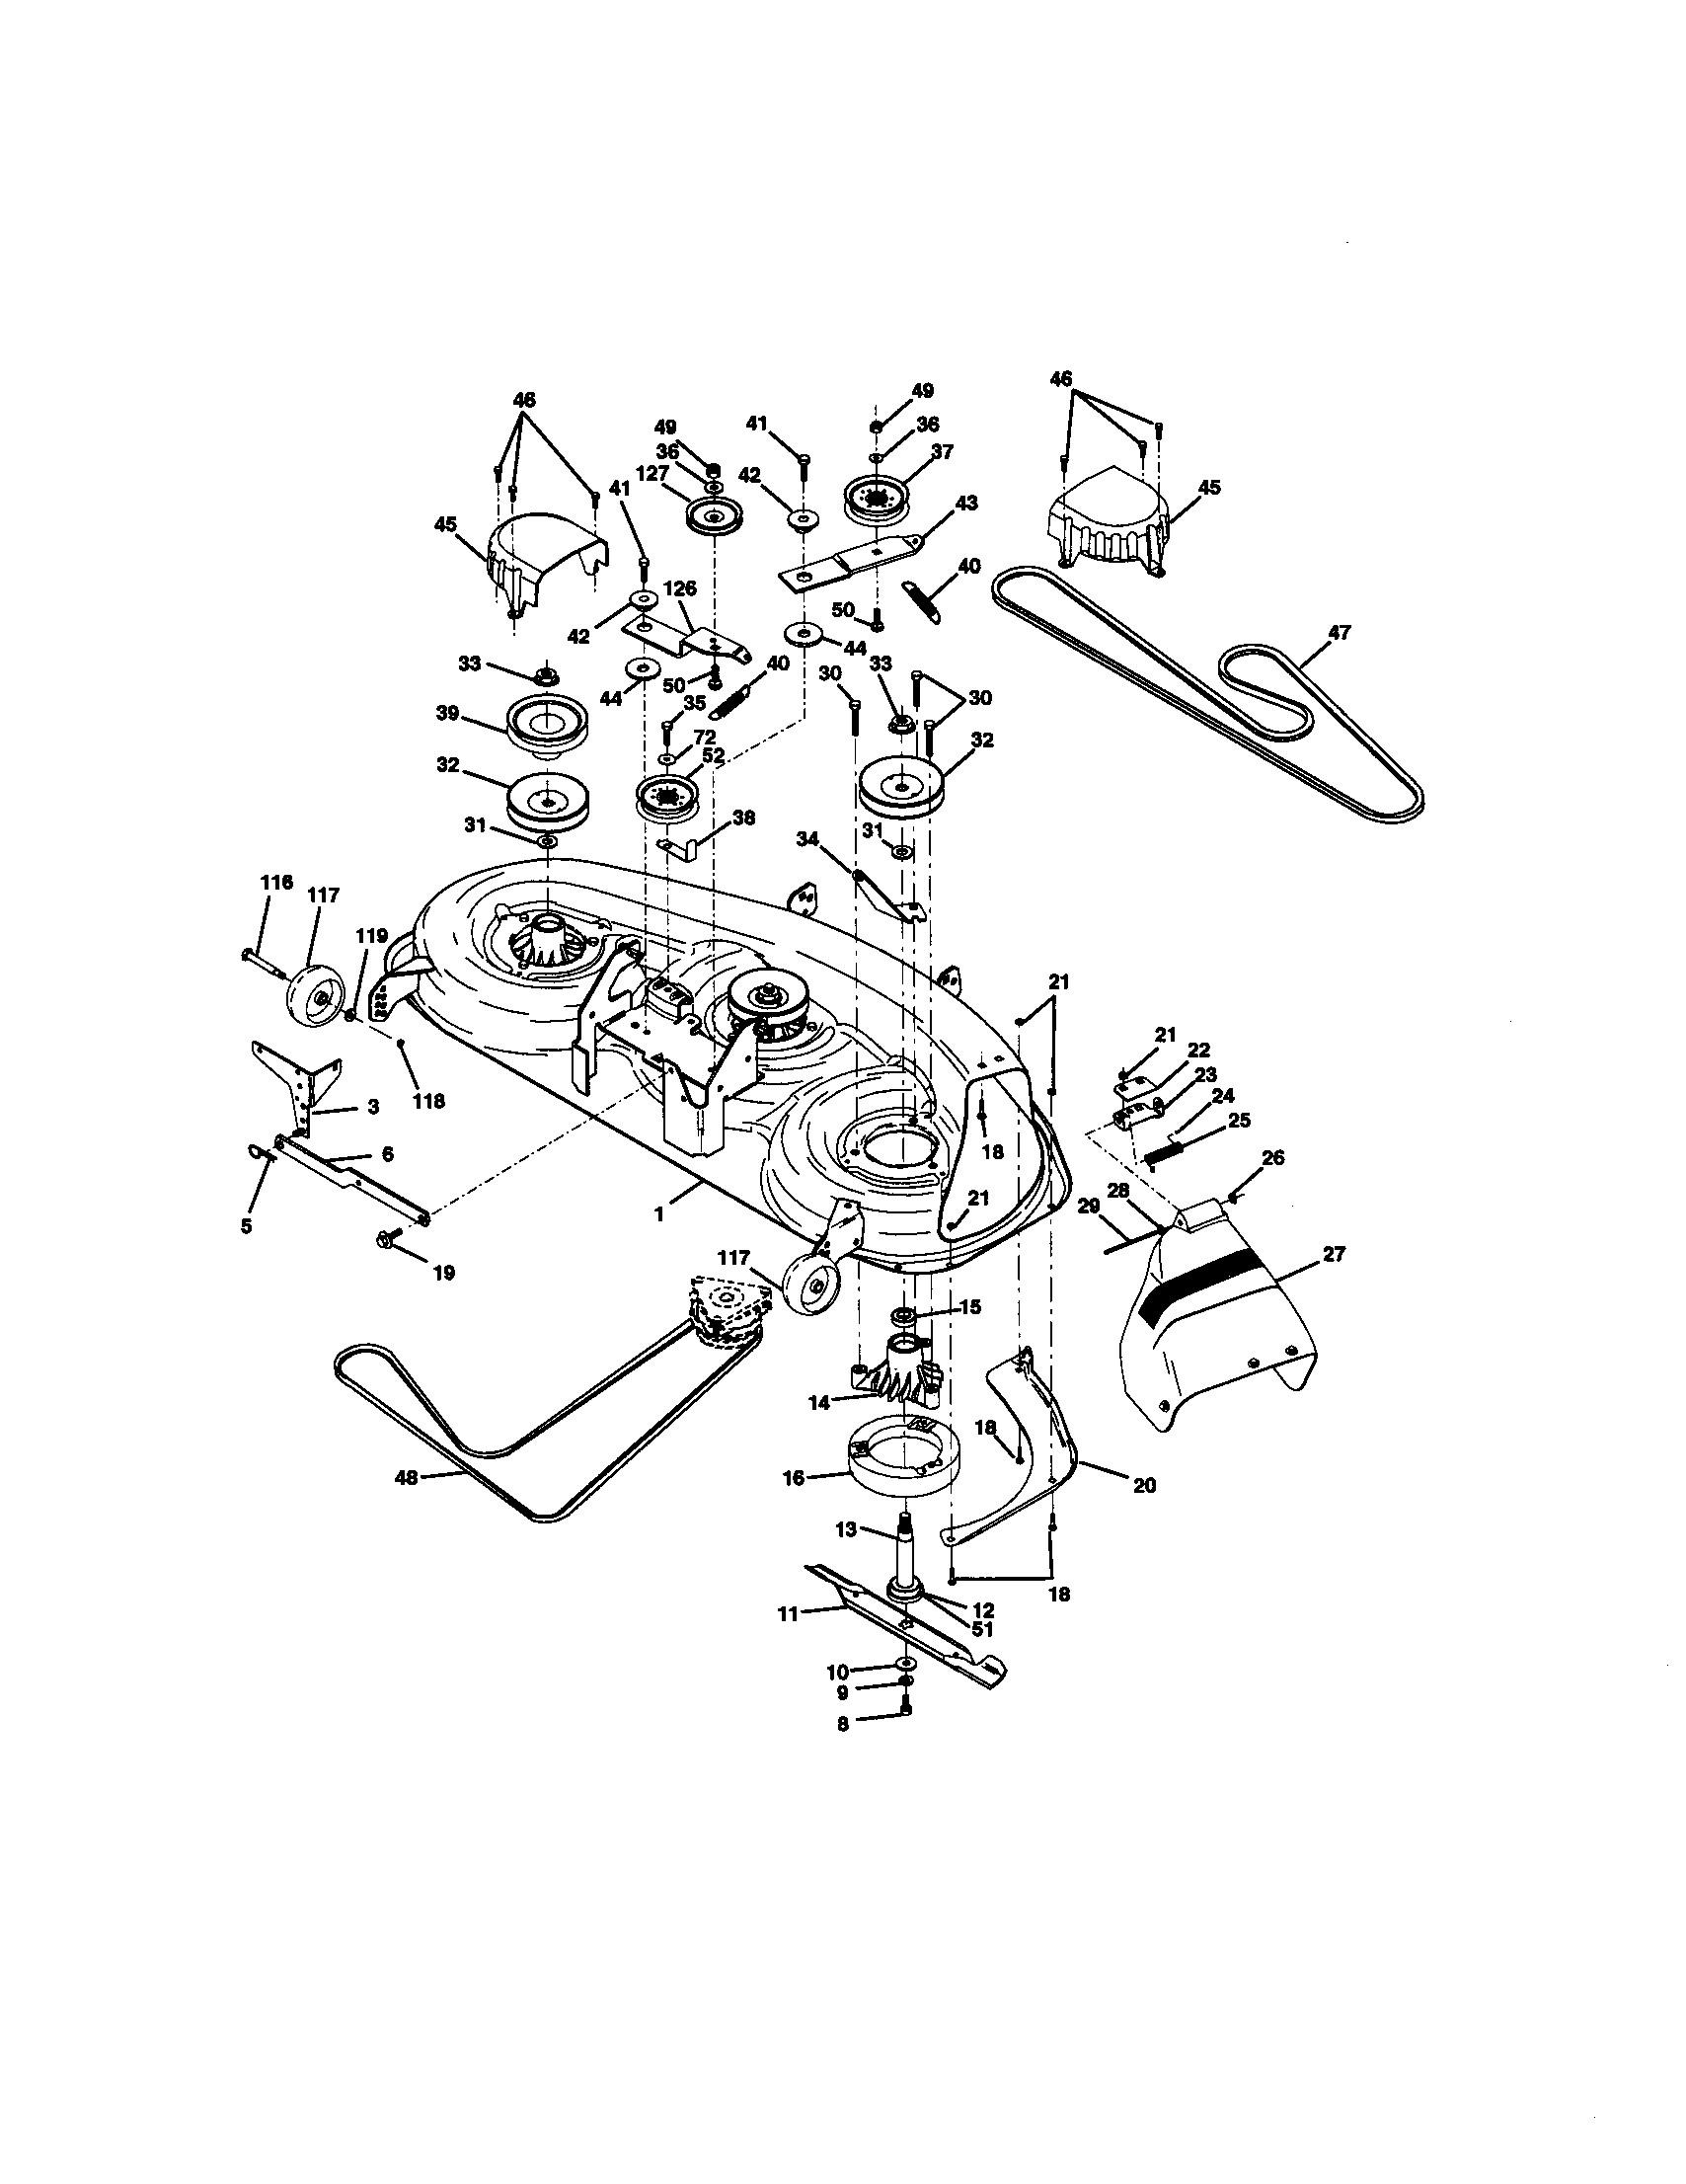 Craftsman Riding Lawn Mower Parts Diagram